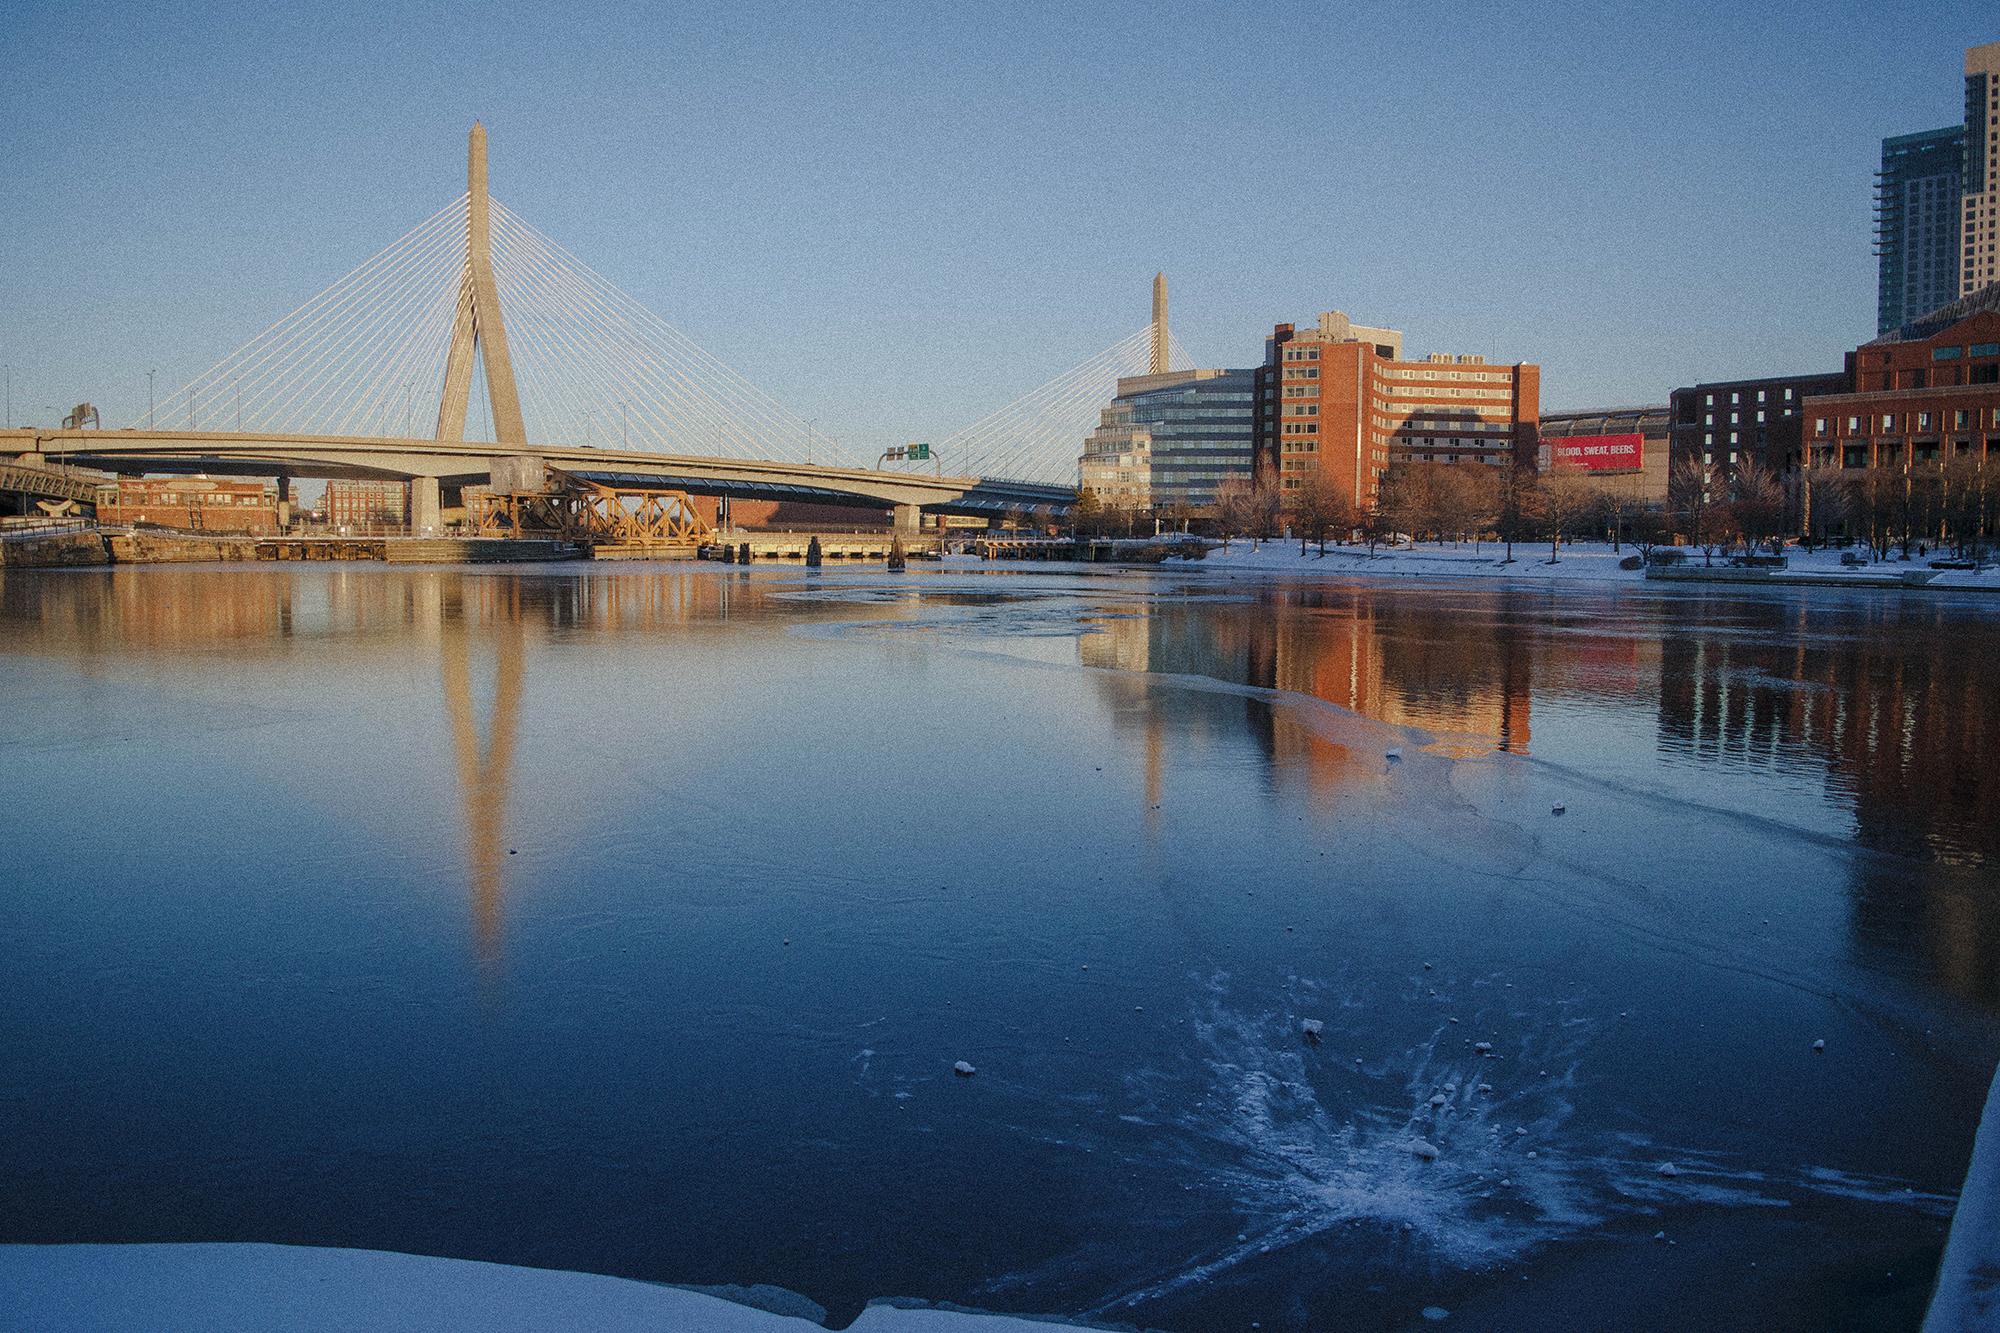 1 - 8 Fun Things to Do in Boston - FilterGrade